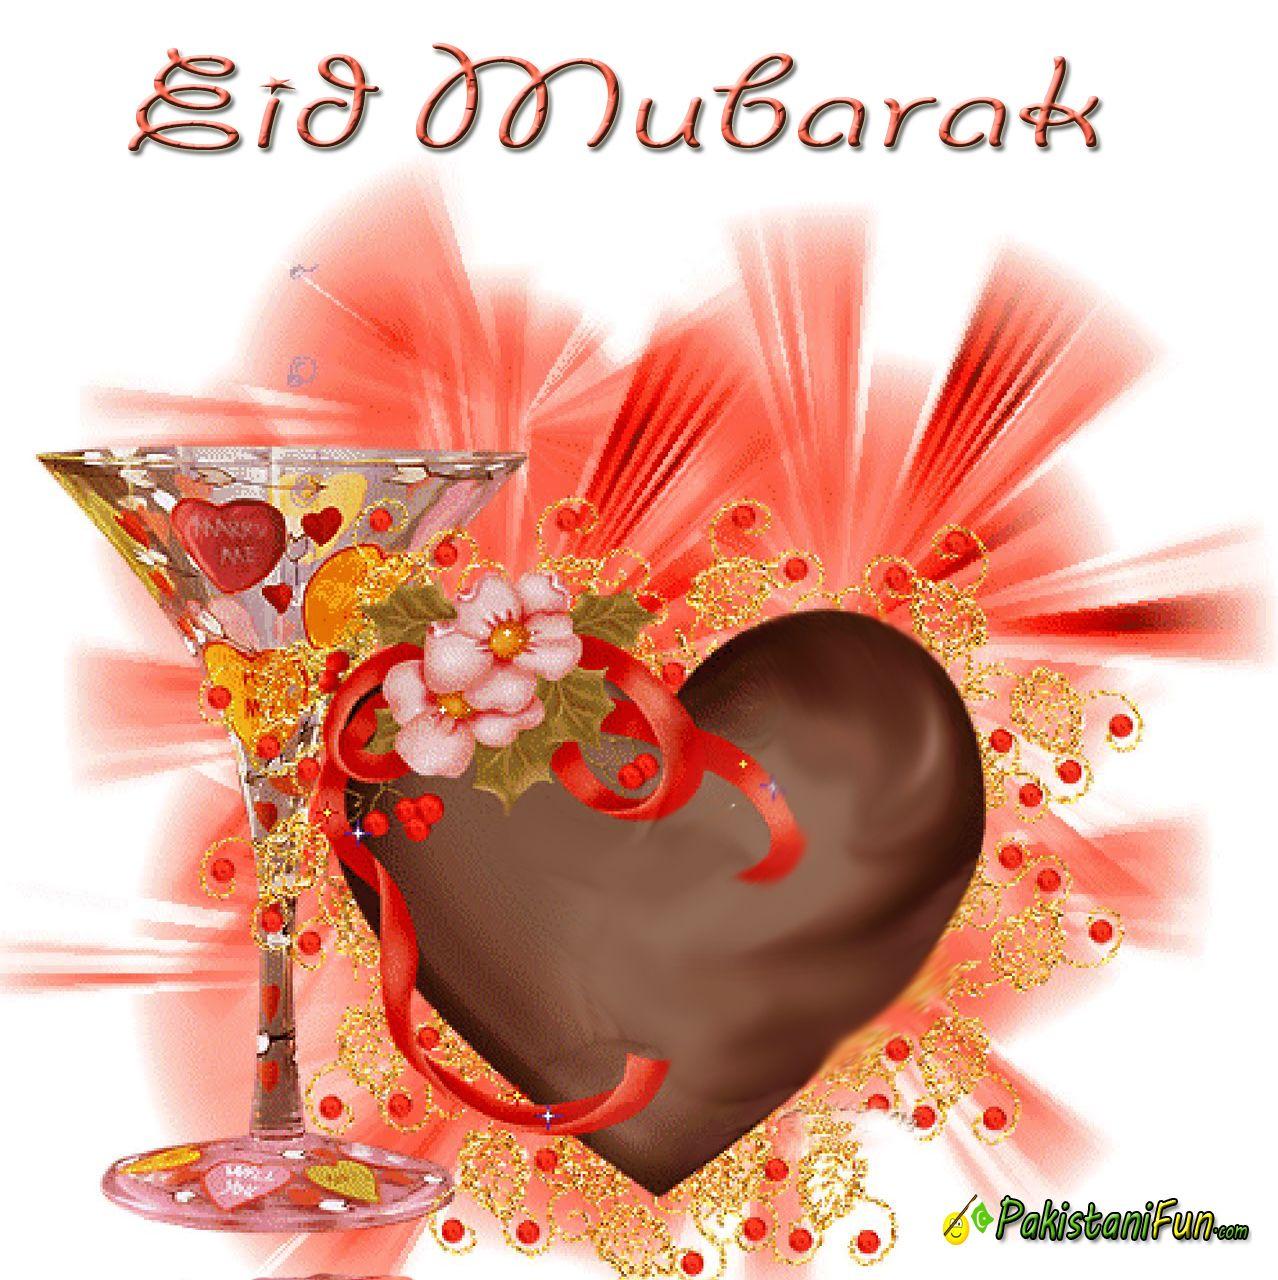 Eid Mubarak Cute Pink Orange Colour Hd Wallpaper Eid Card Full